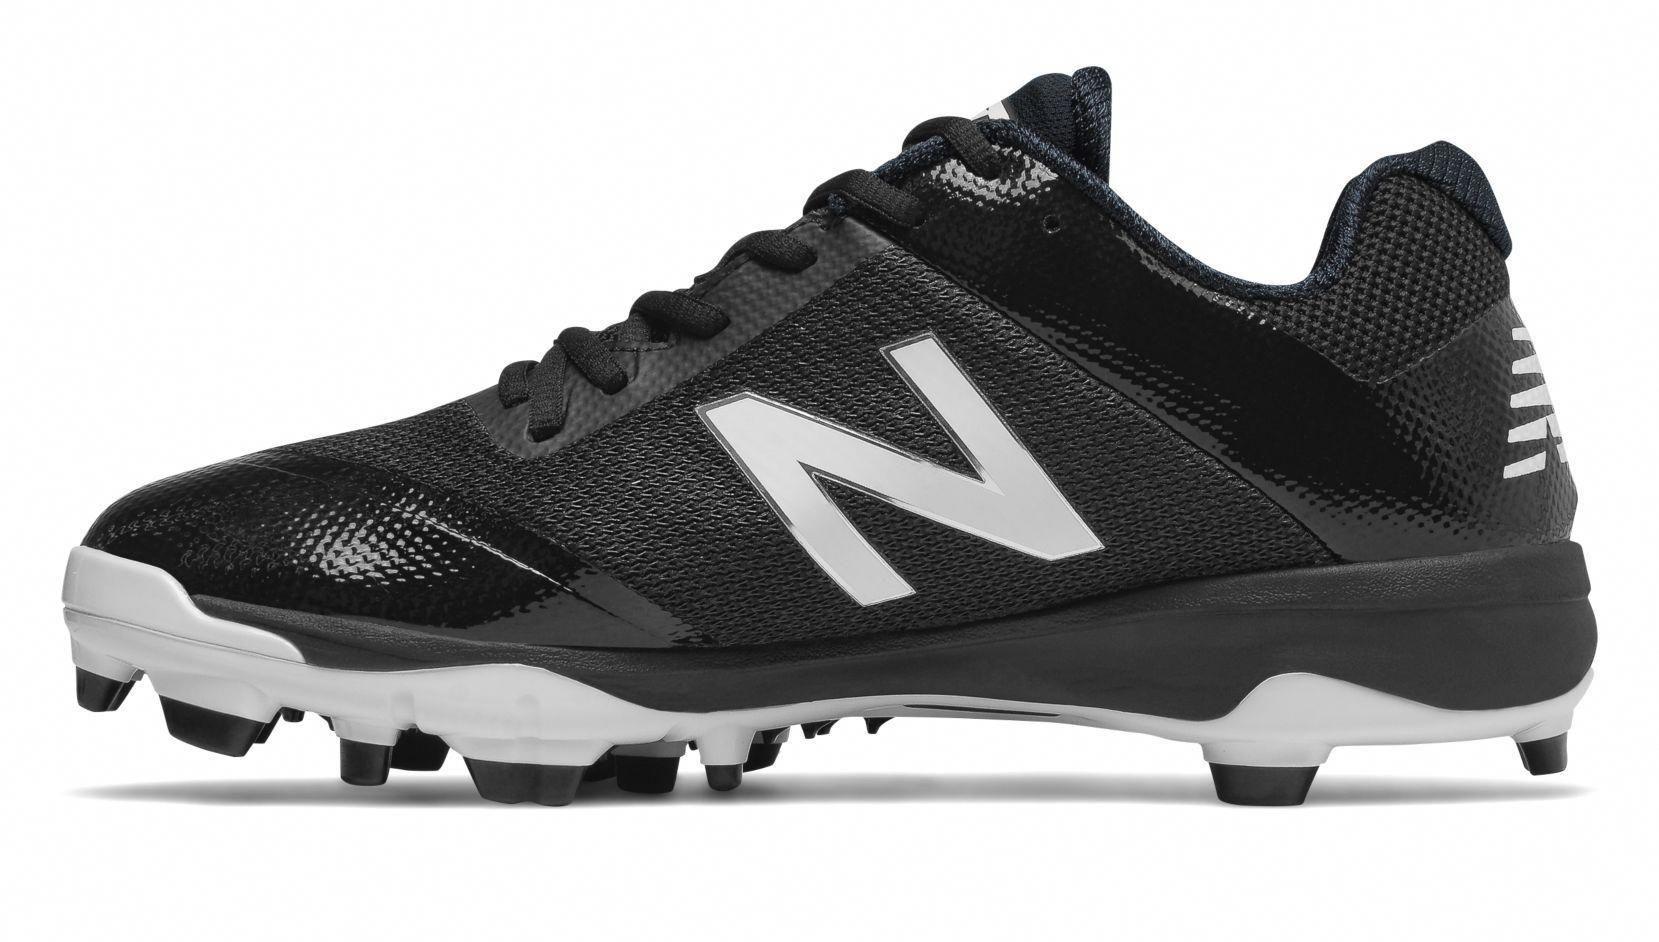 new style 2c20f d0e3c New Balance Mens Molded Baseball Cleat  TPU 4040v4  baseballcleats